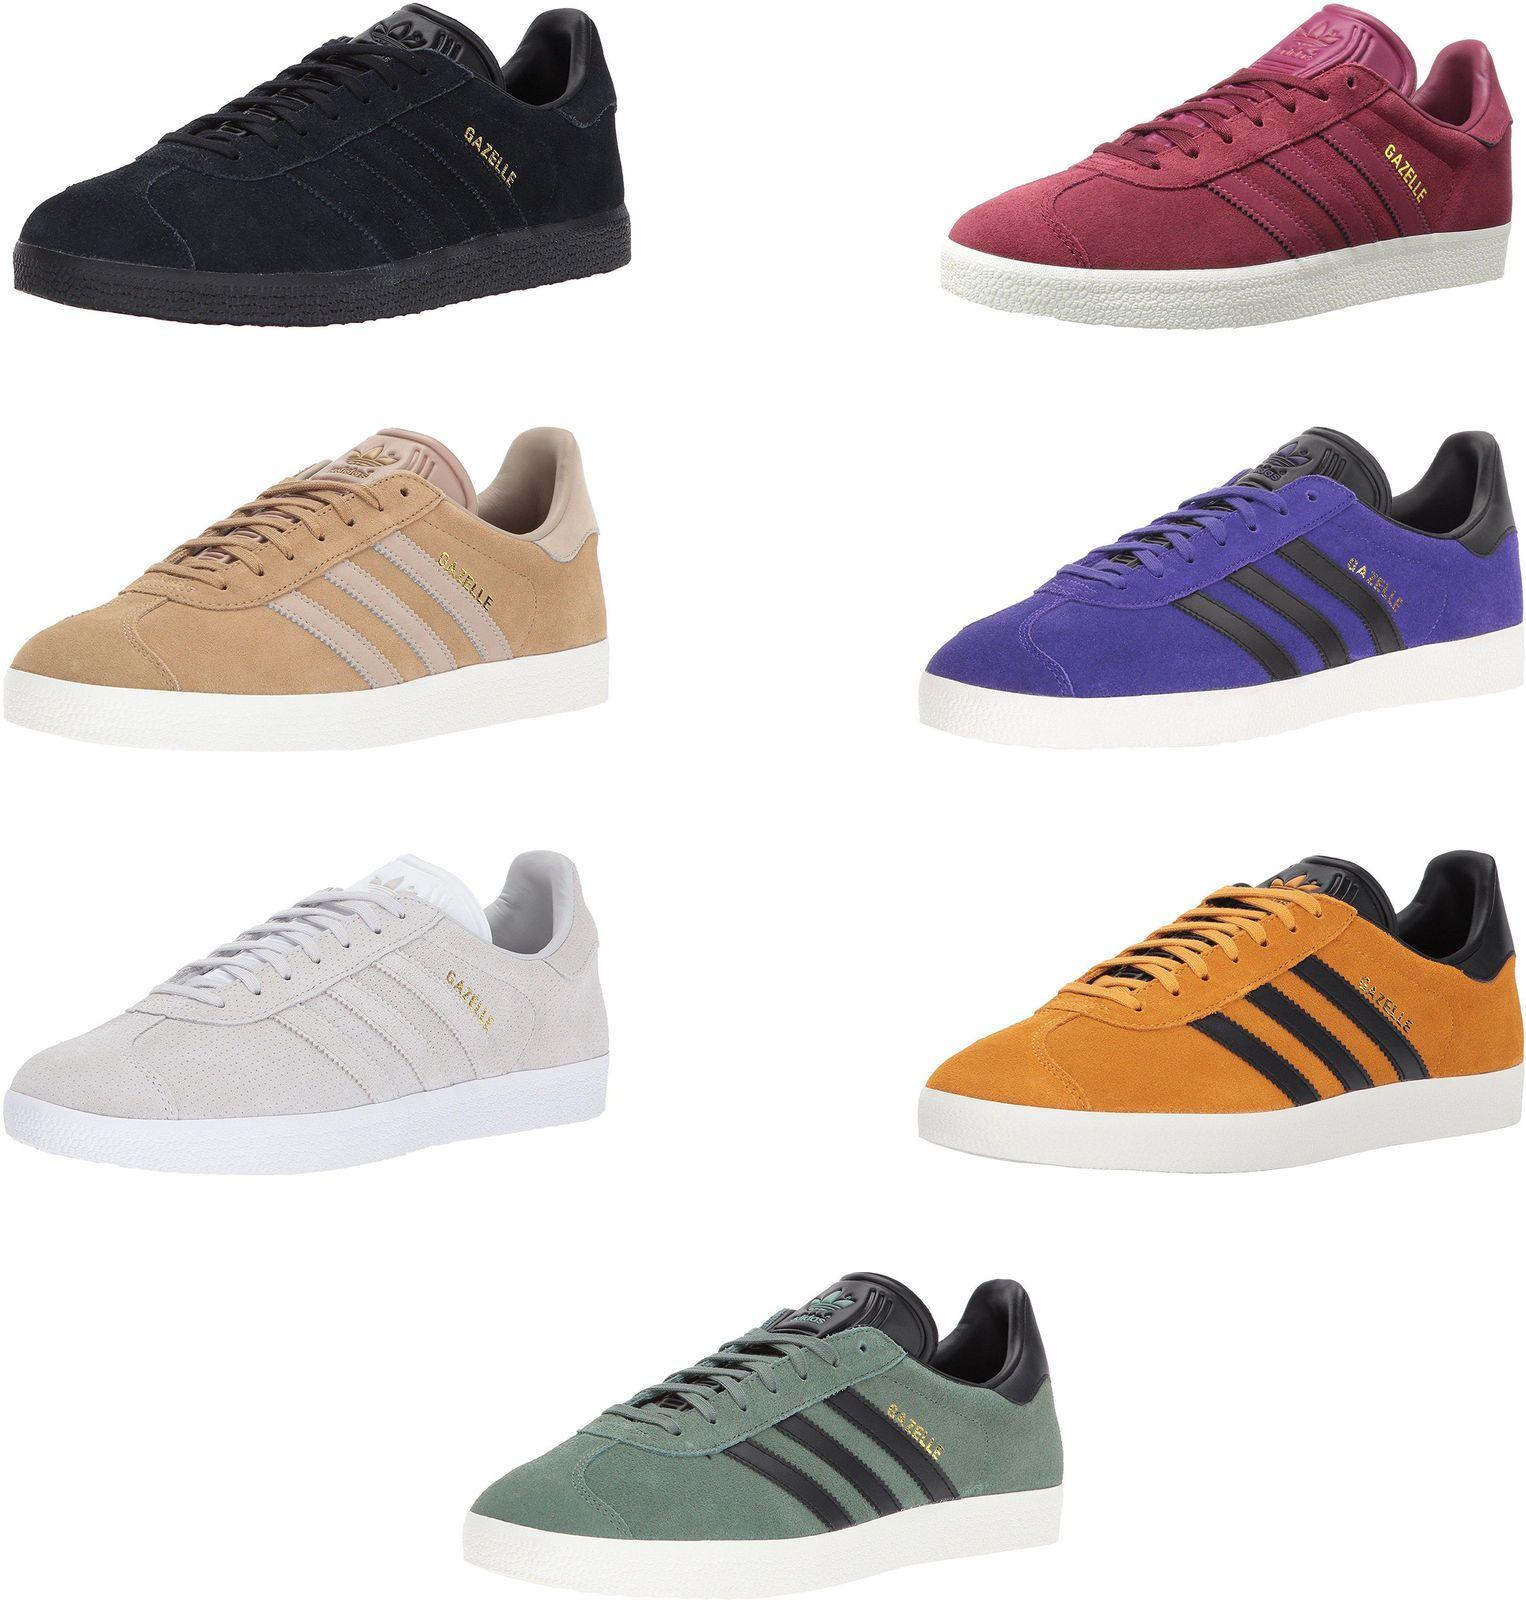 adidas originali mens gazzella scarpe 7 colori spesa riguarda